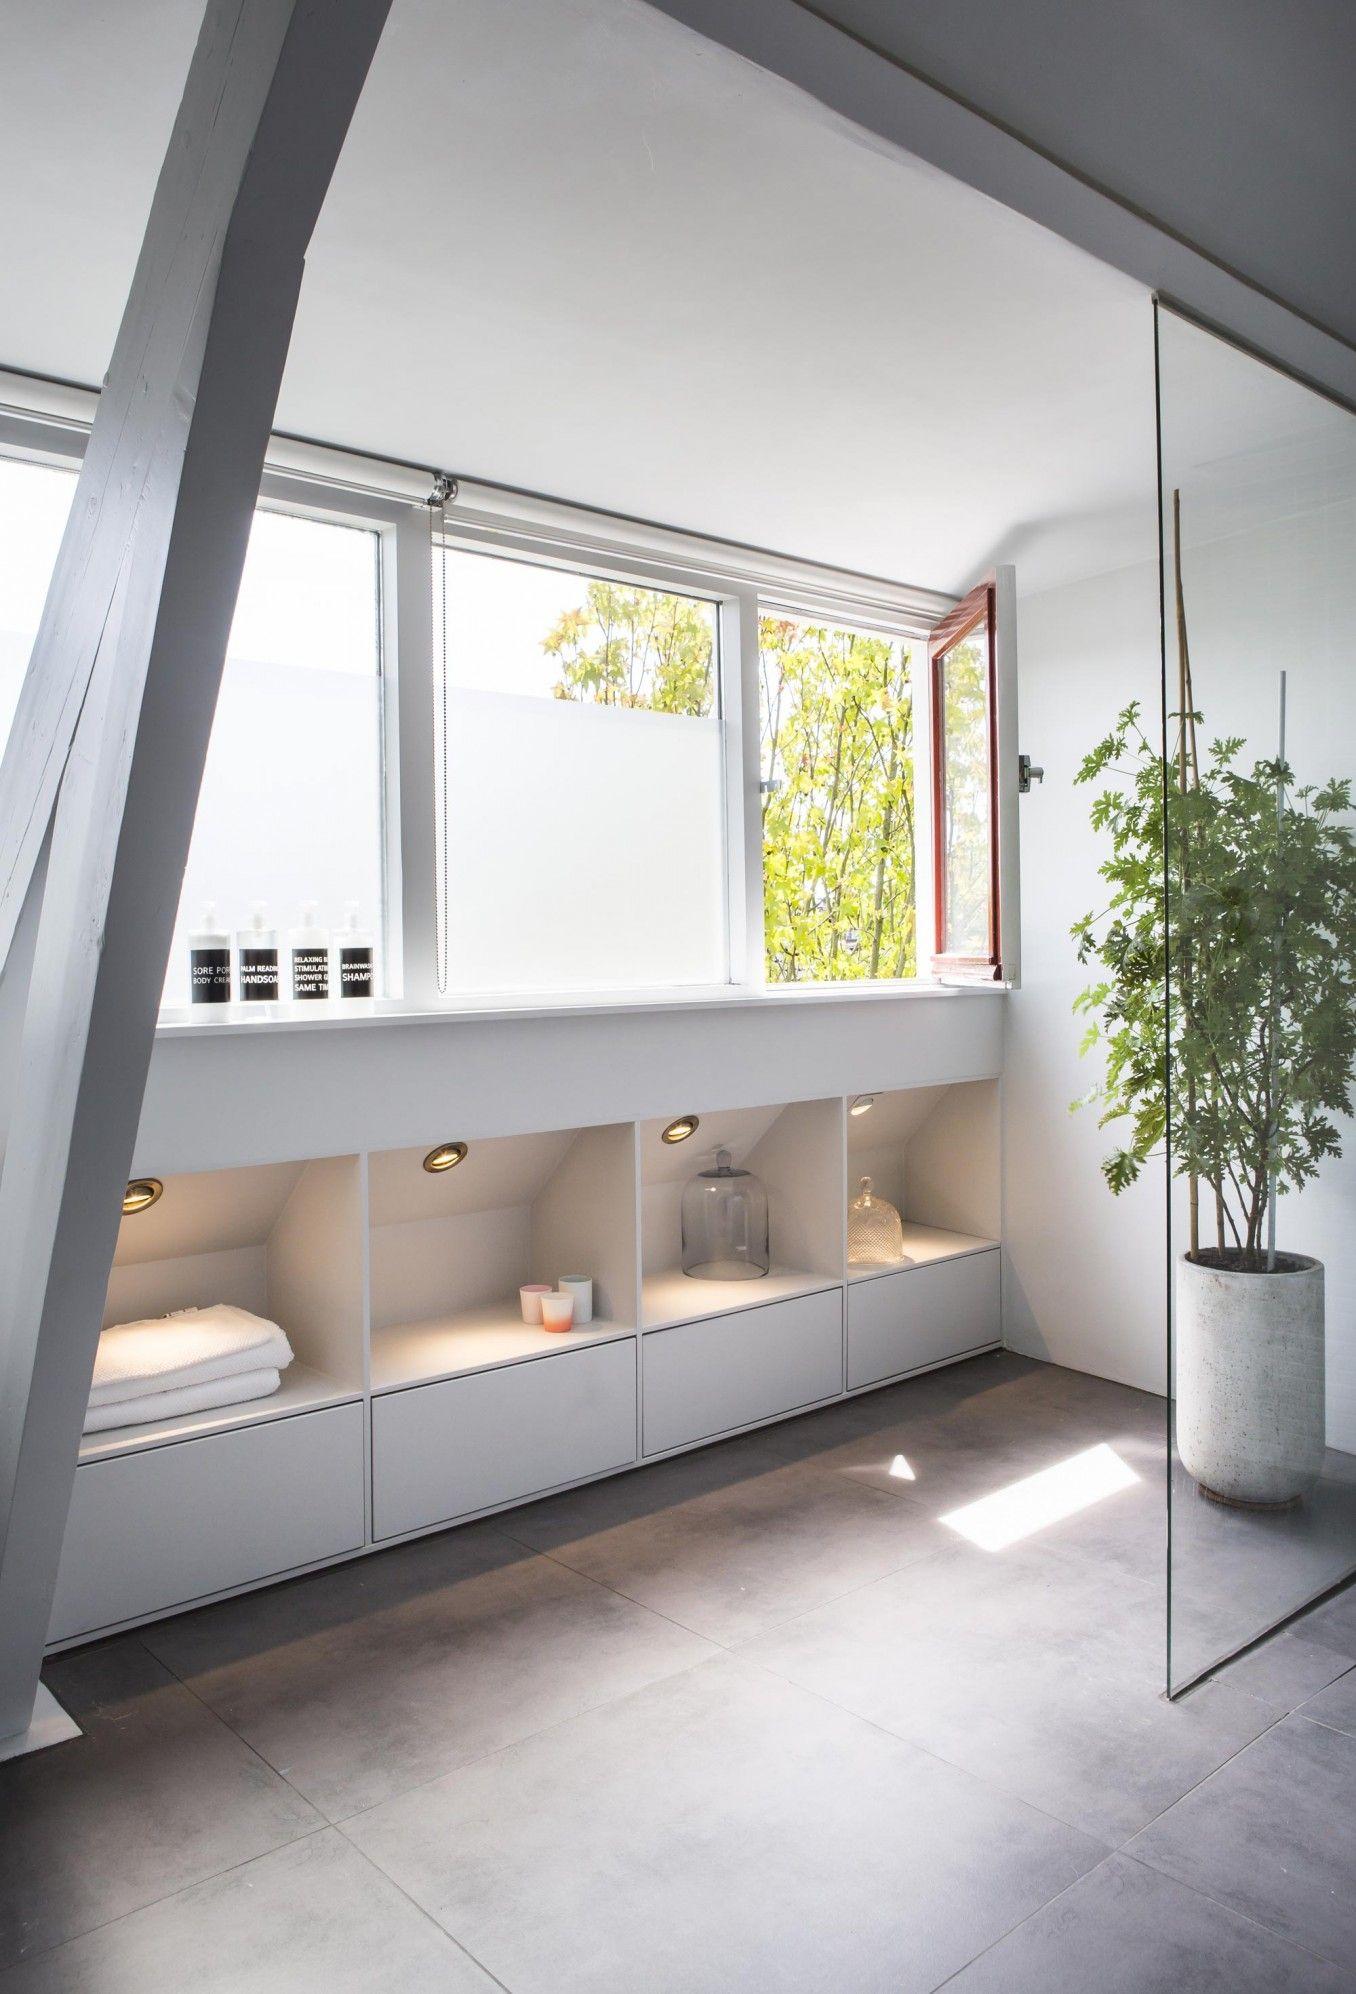 Badkamer / zolder idee | badkamer | Pinterest | Interiors, Attic and ...